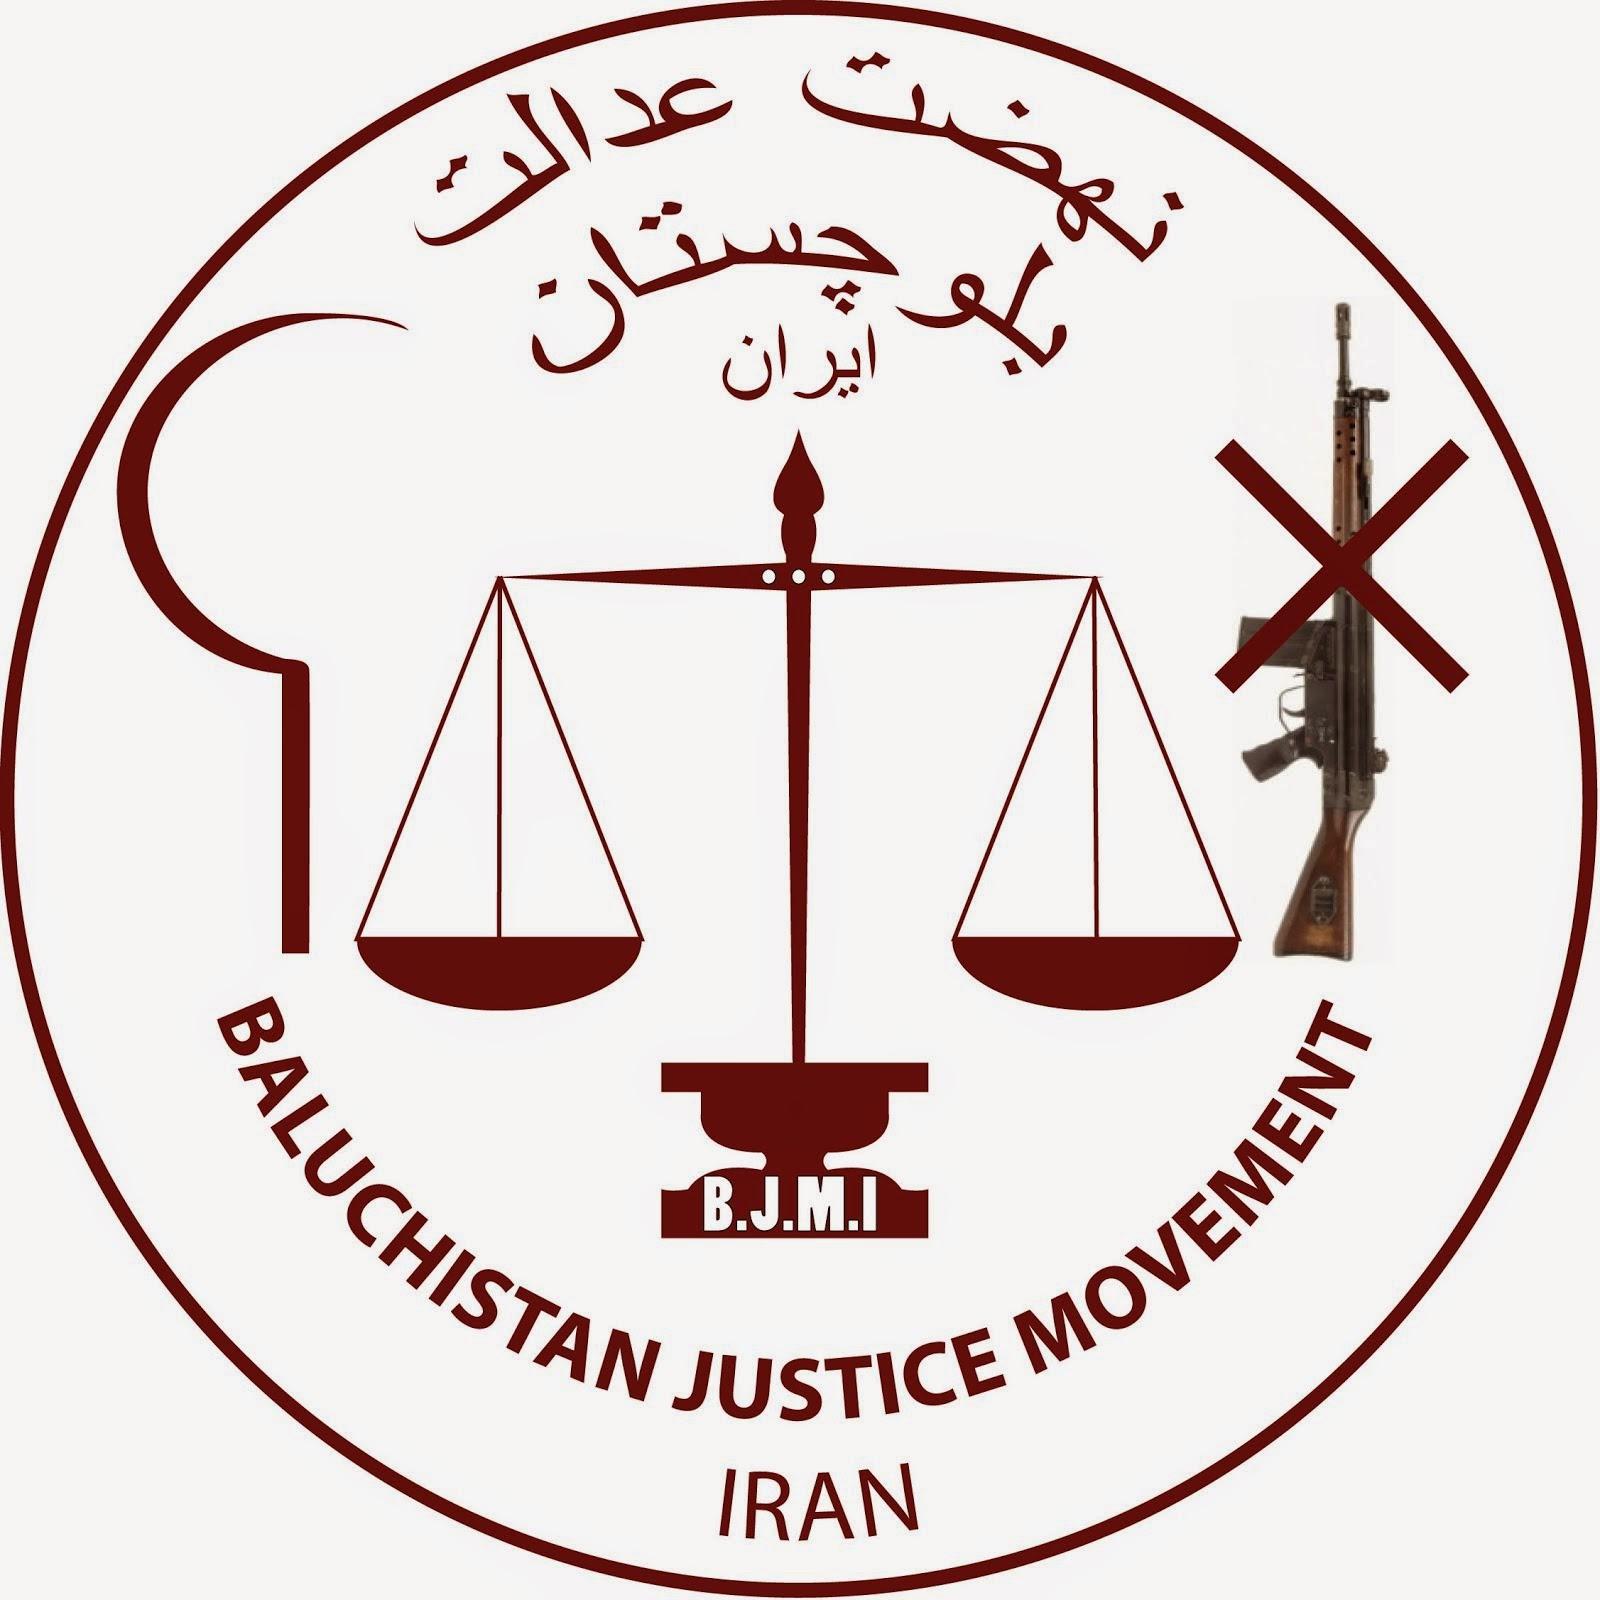 آرم نهضت عدالت بلوچستان